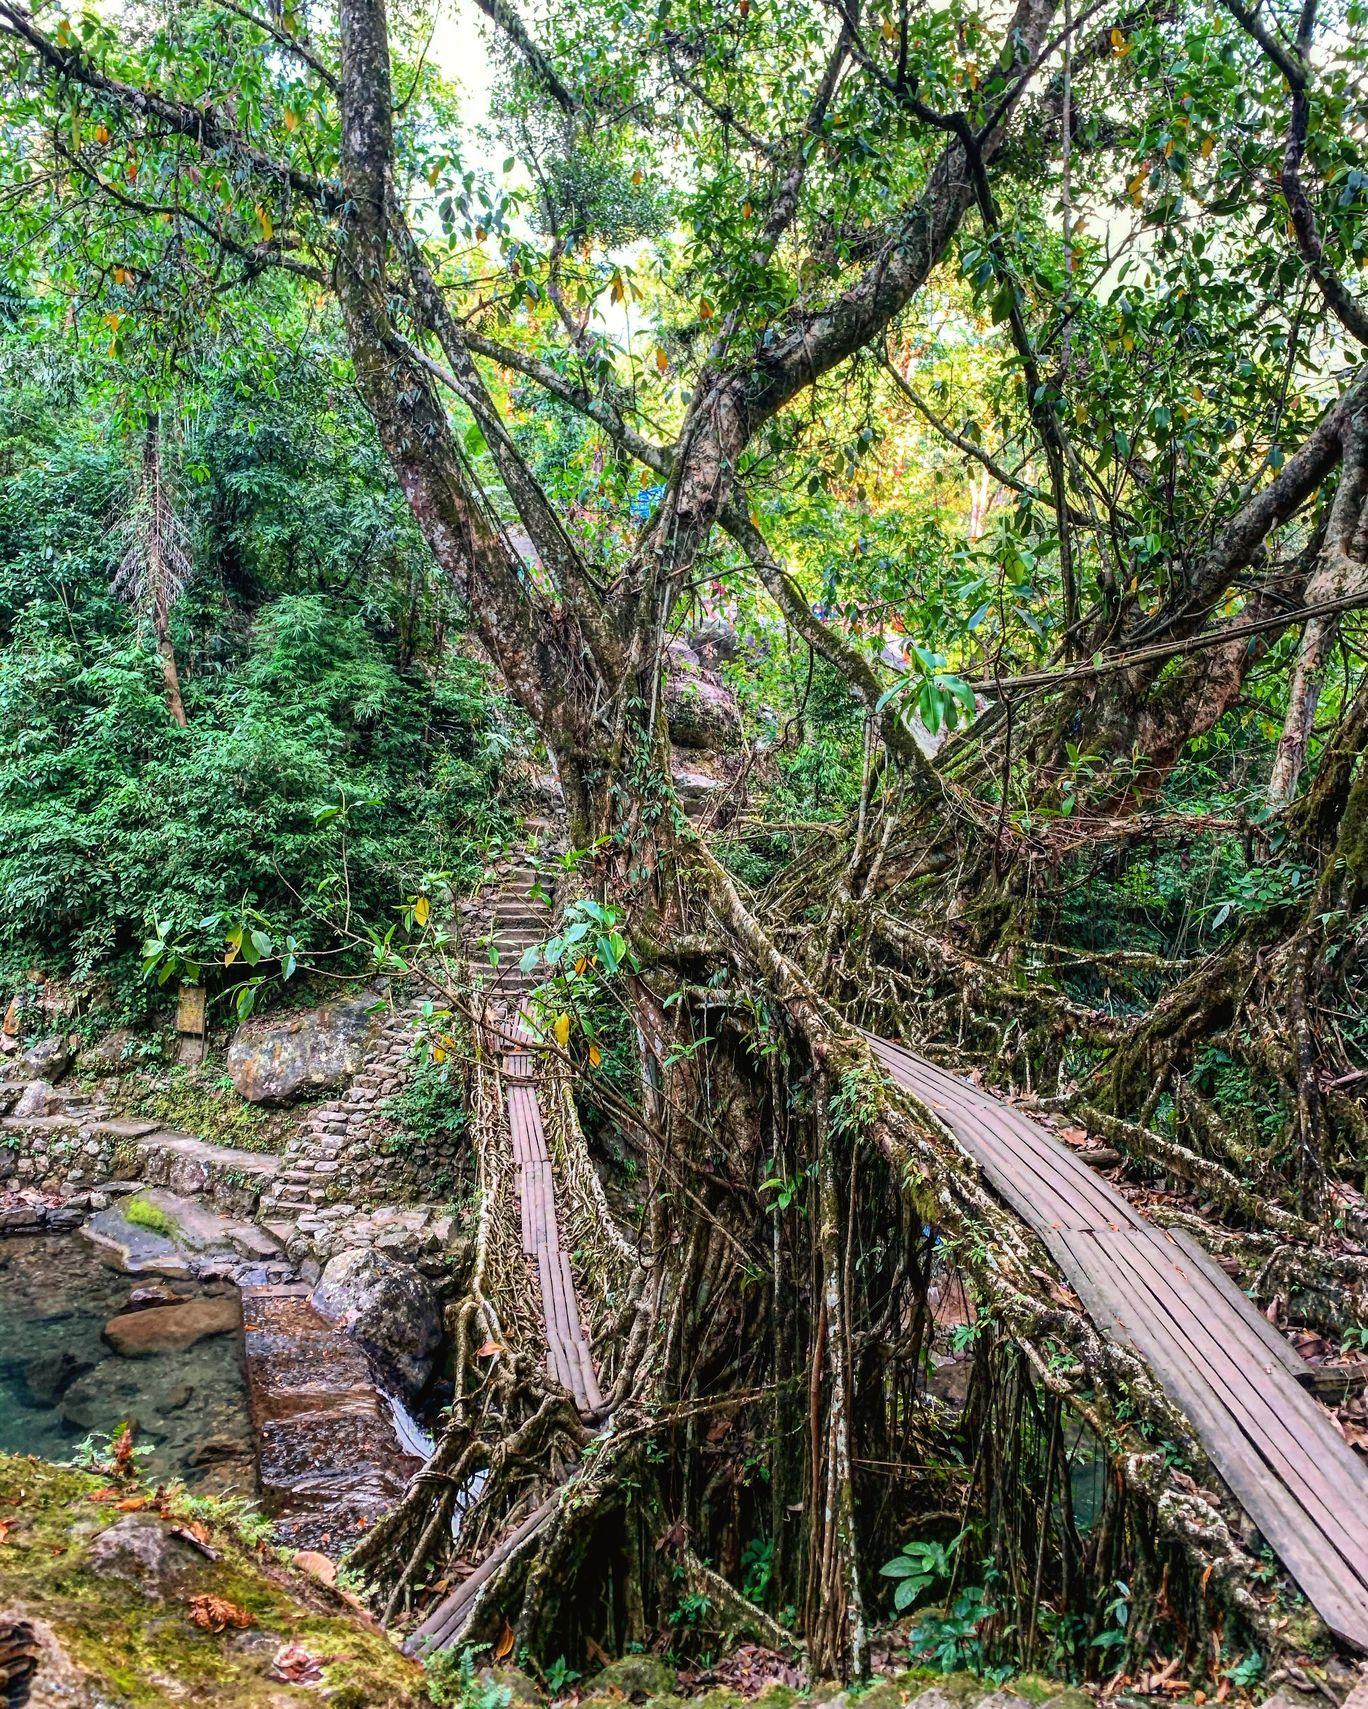 Photo of Double Decker Living Root Bridge By Apeksha Sharma